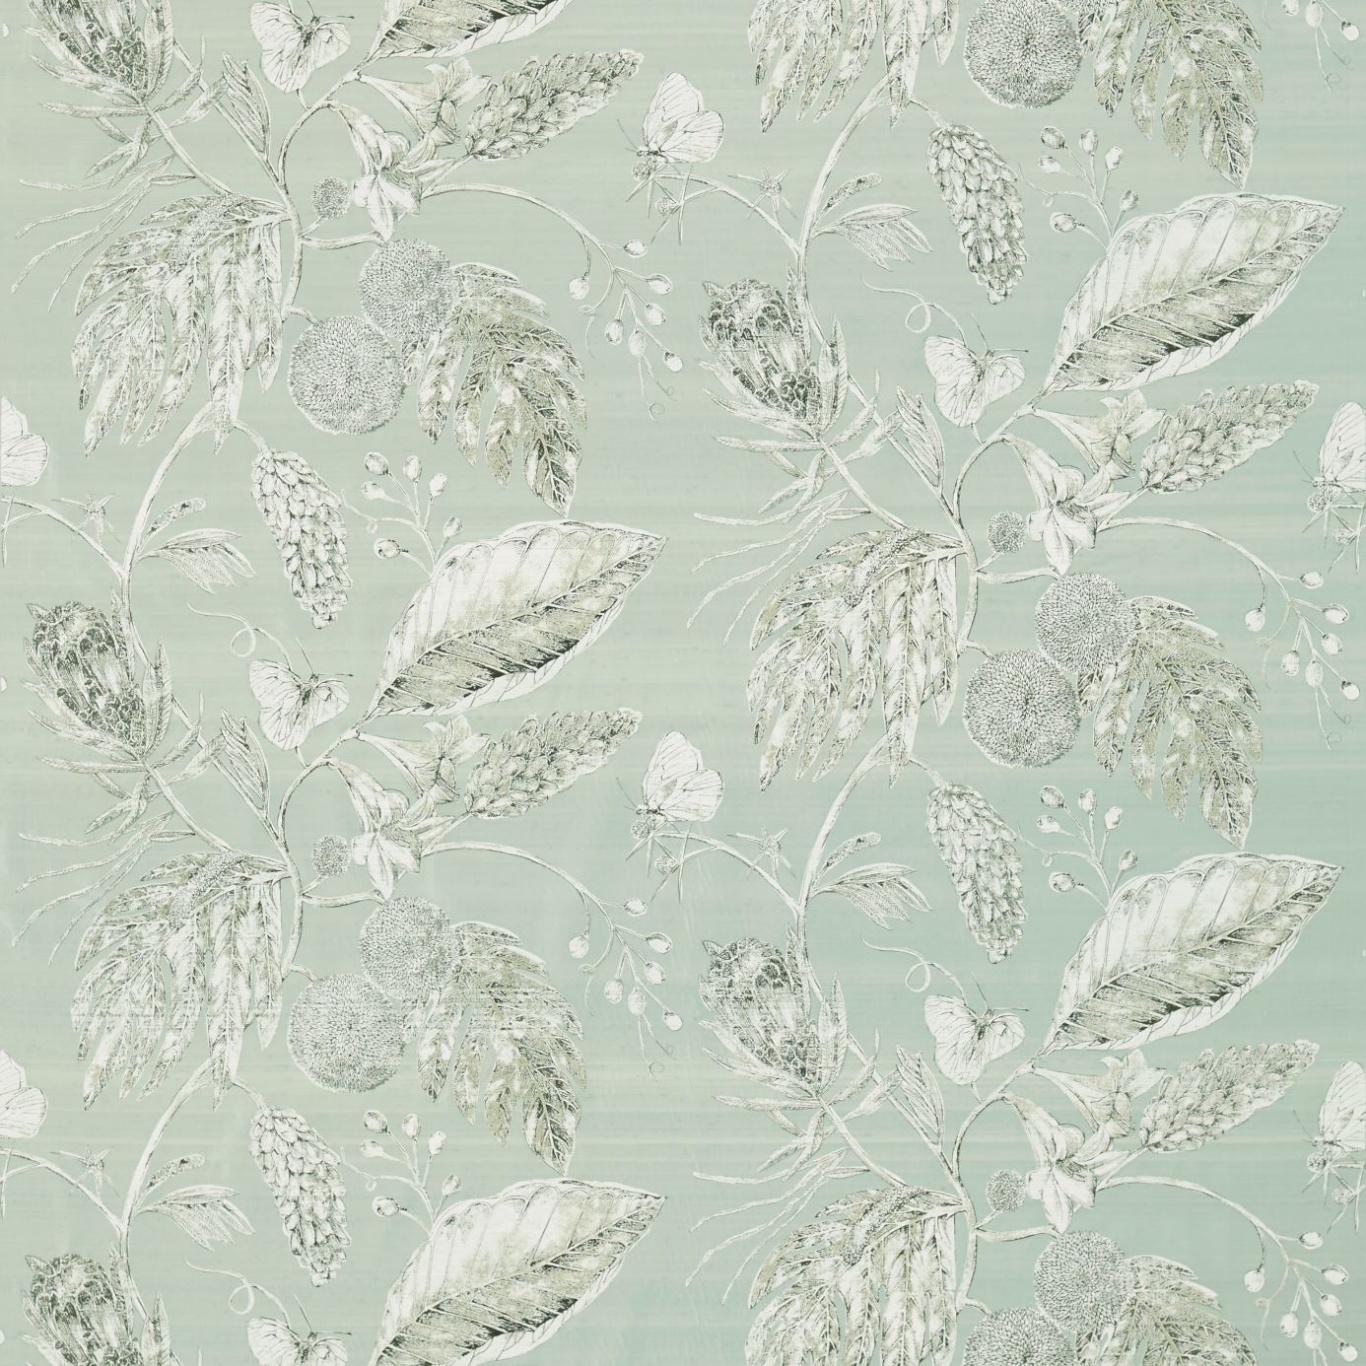 Image of Harlequin Amborella Silk Seaglass Curtain Fabric 120419